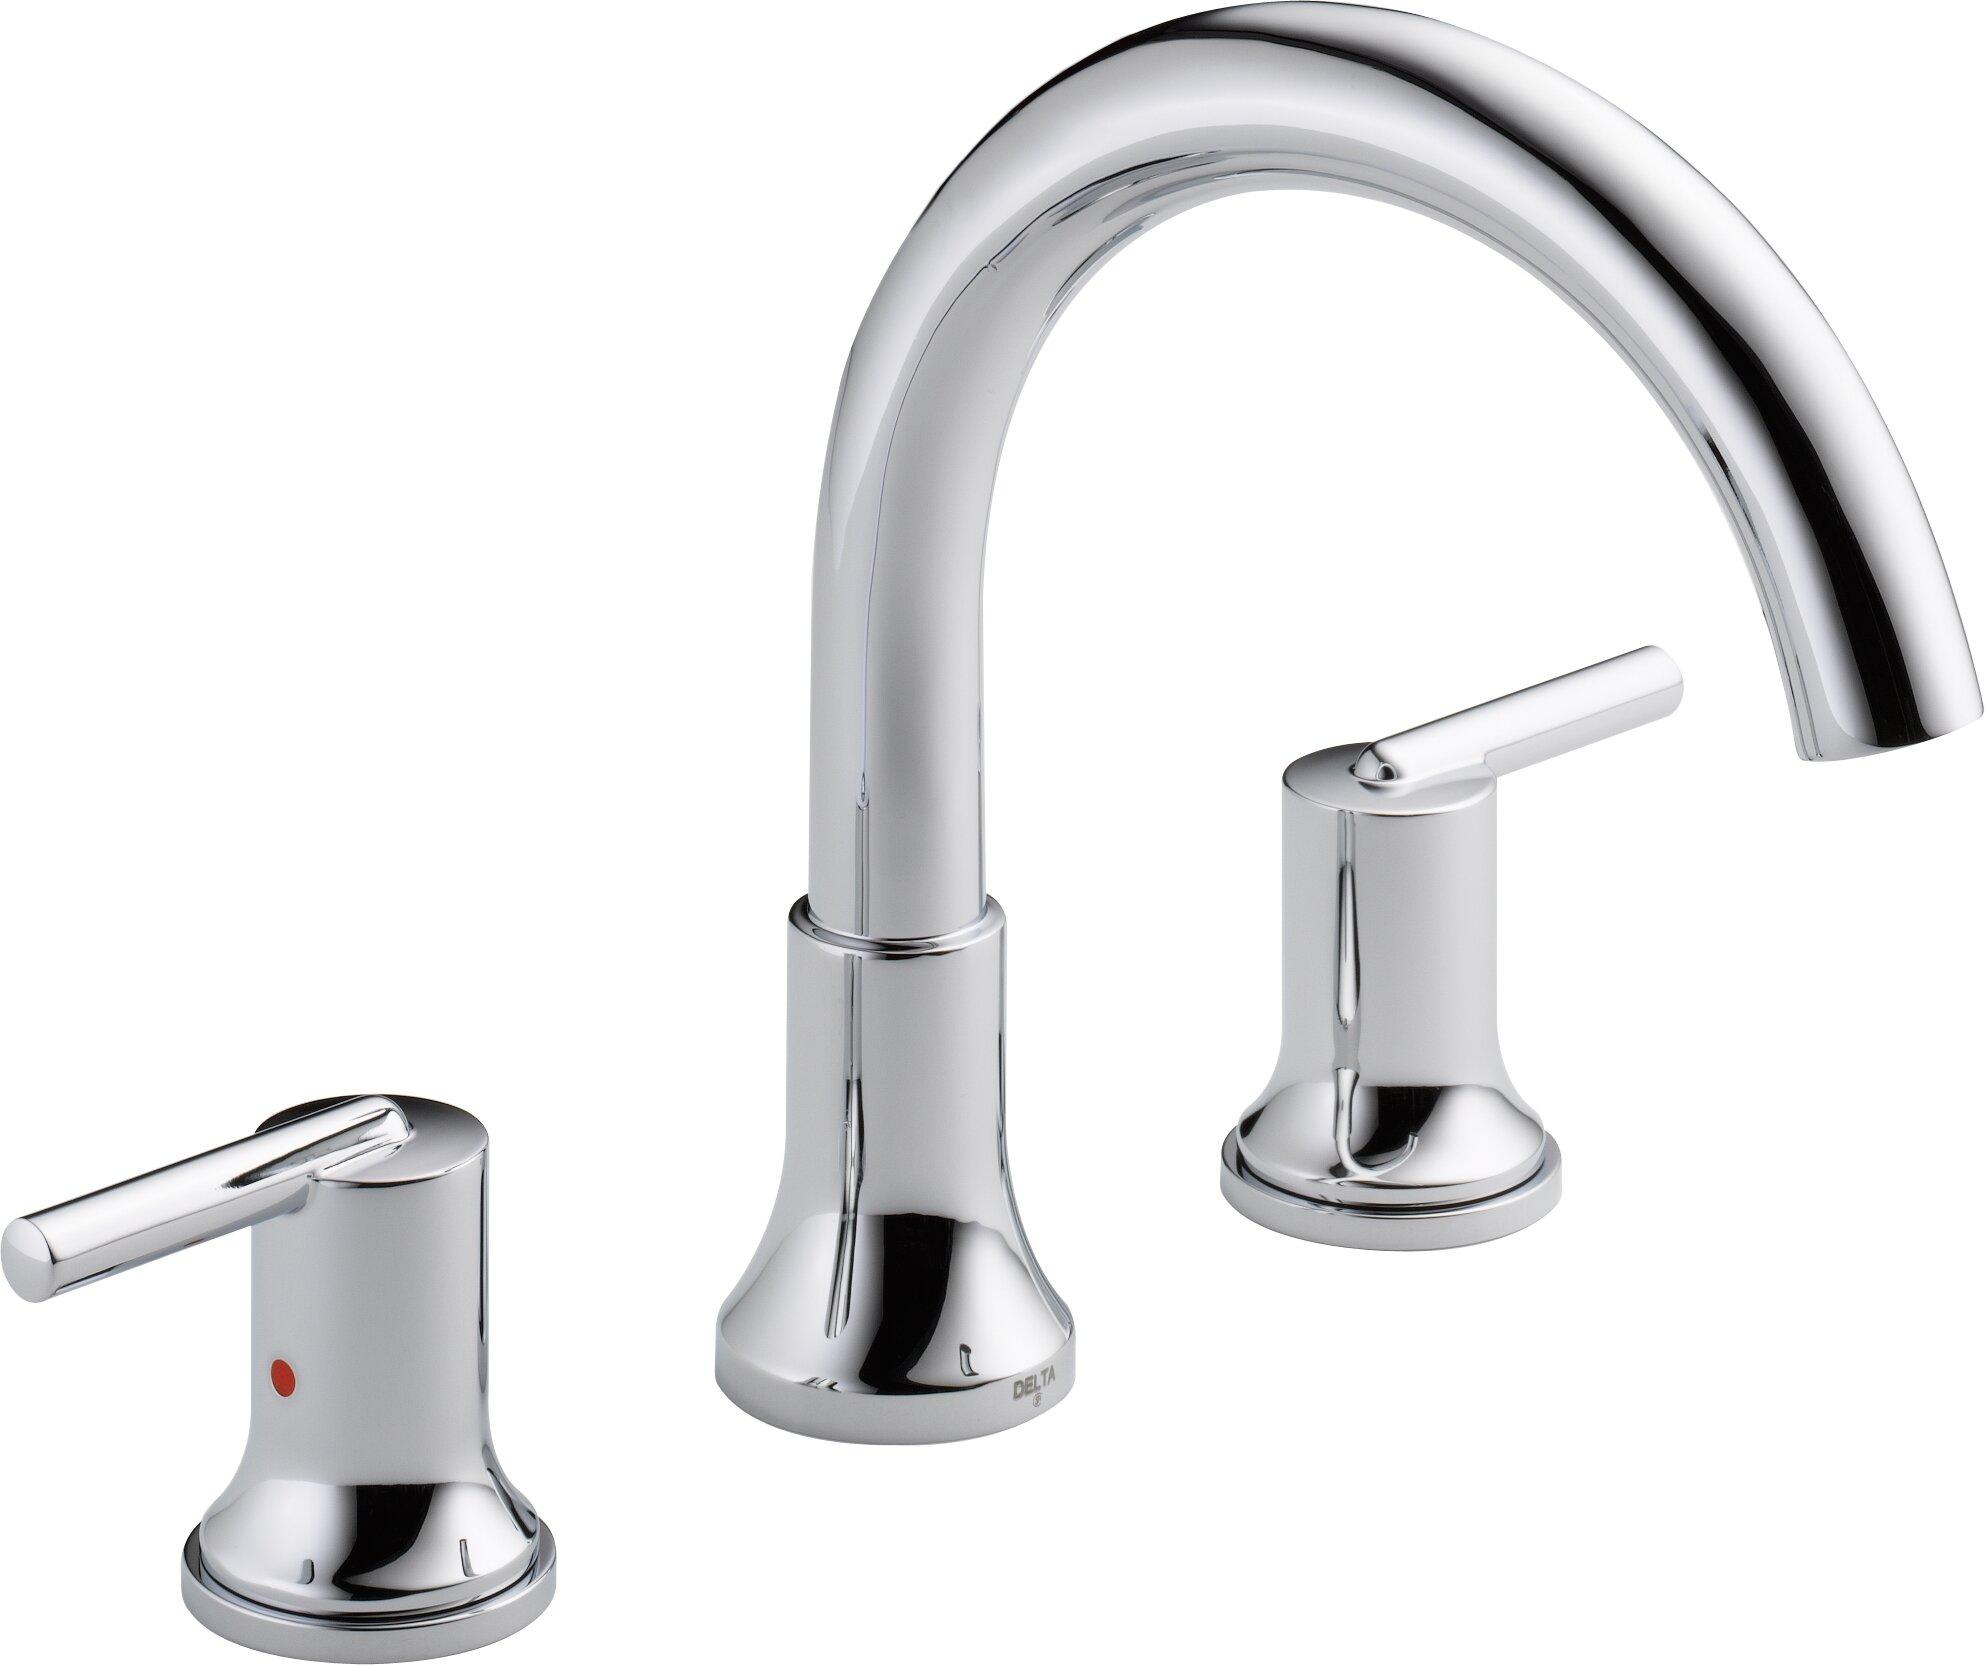 Trinsic Double Handle Deck Mounted Roman Tub Faucet Trim Reviews Allmodern